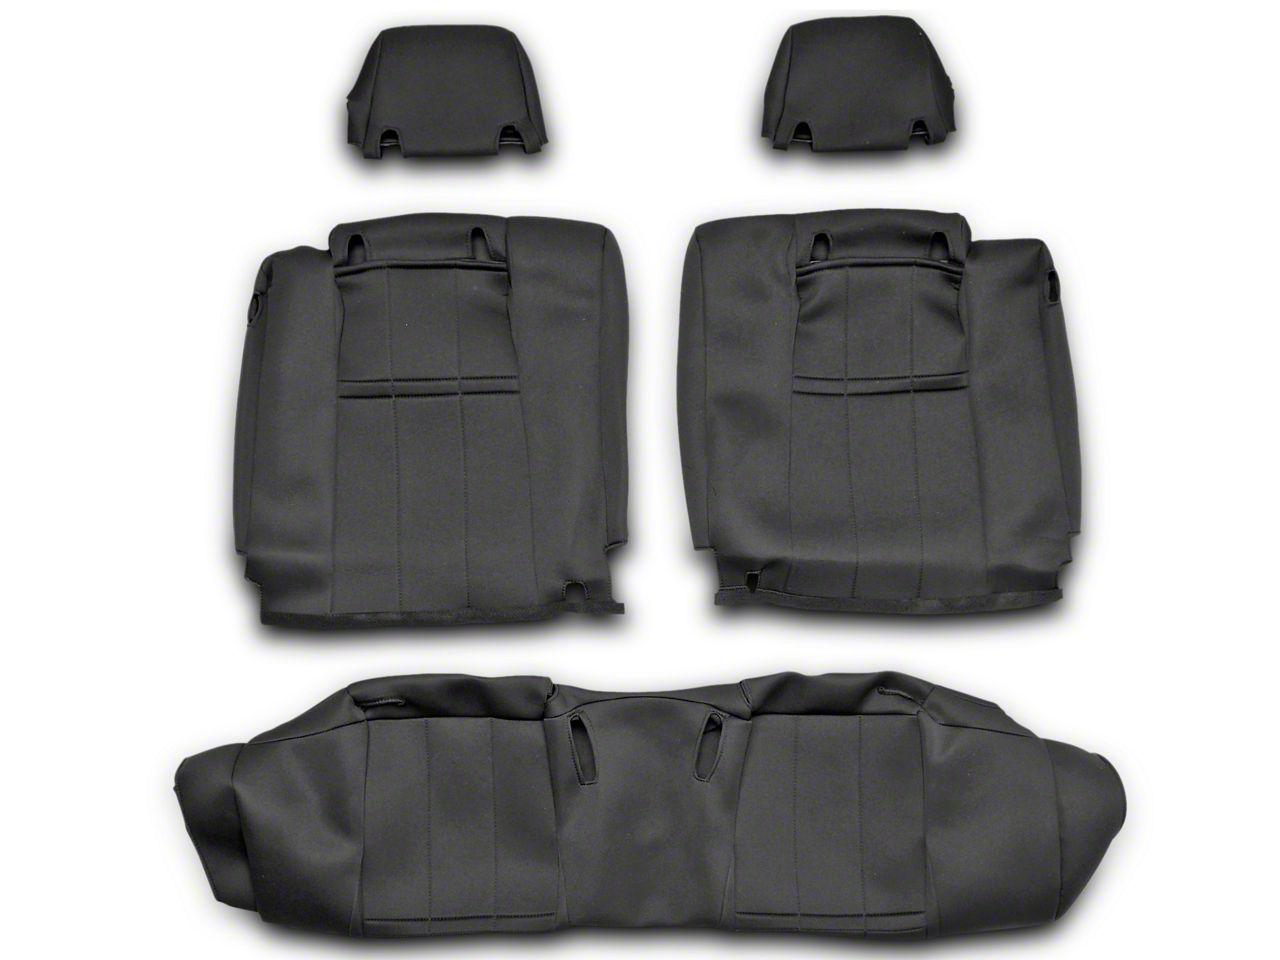 Caltrend NeoSupreme Rear Seat Cover - Black - Solid Rear Seat (10-14 All)